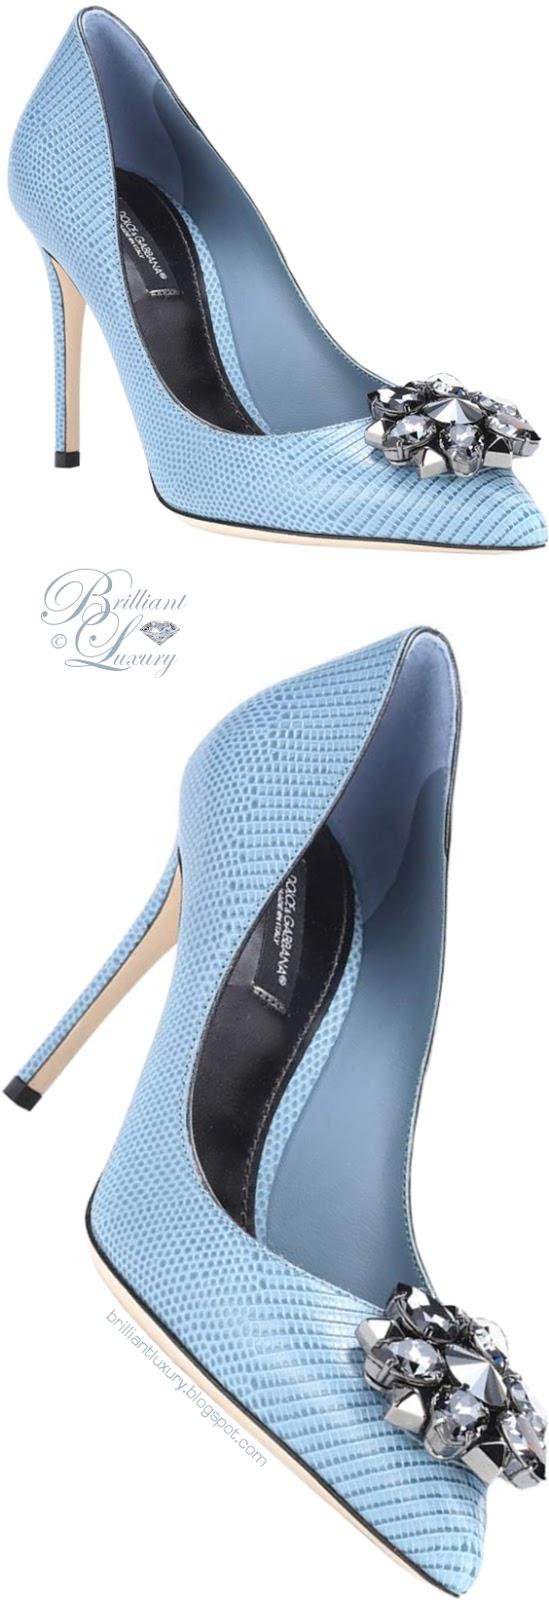 Brilliant Luxury ♦ Dolce & Gabbana Bellucci blue leather pumps